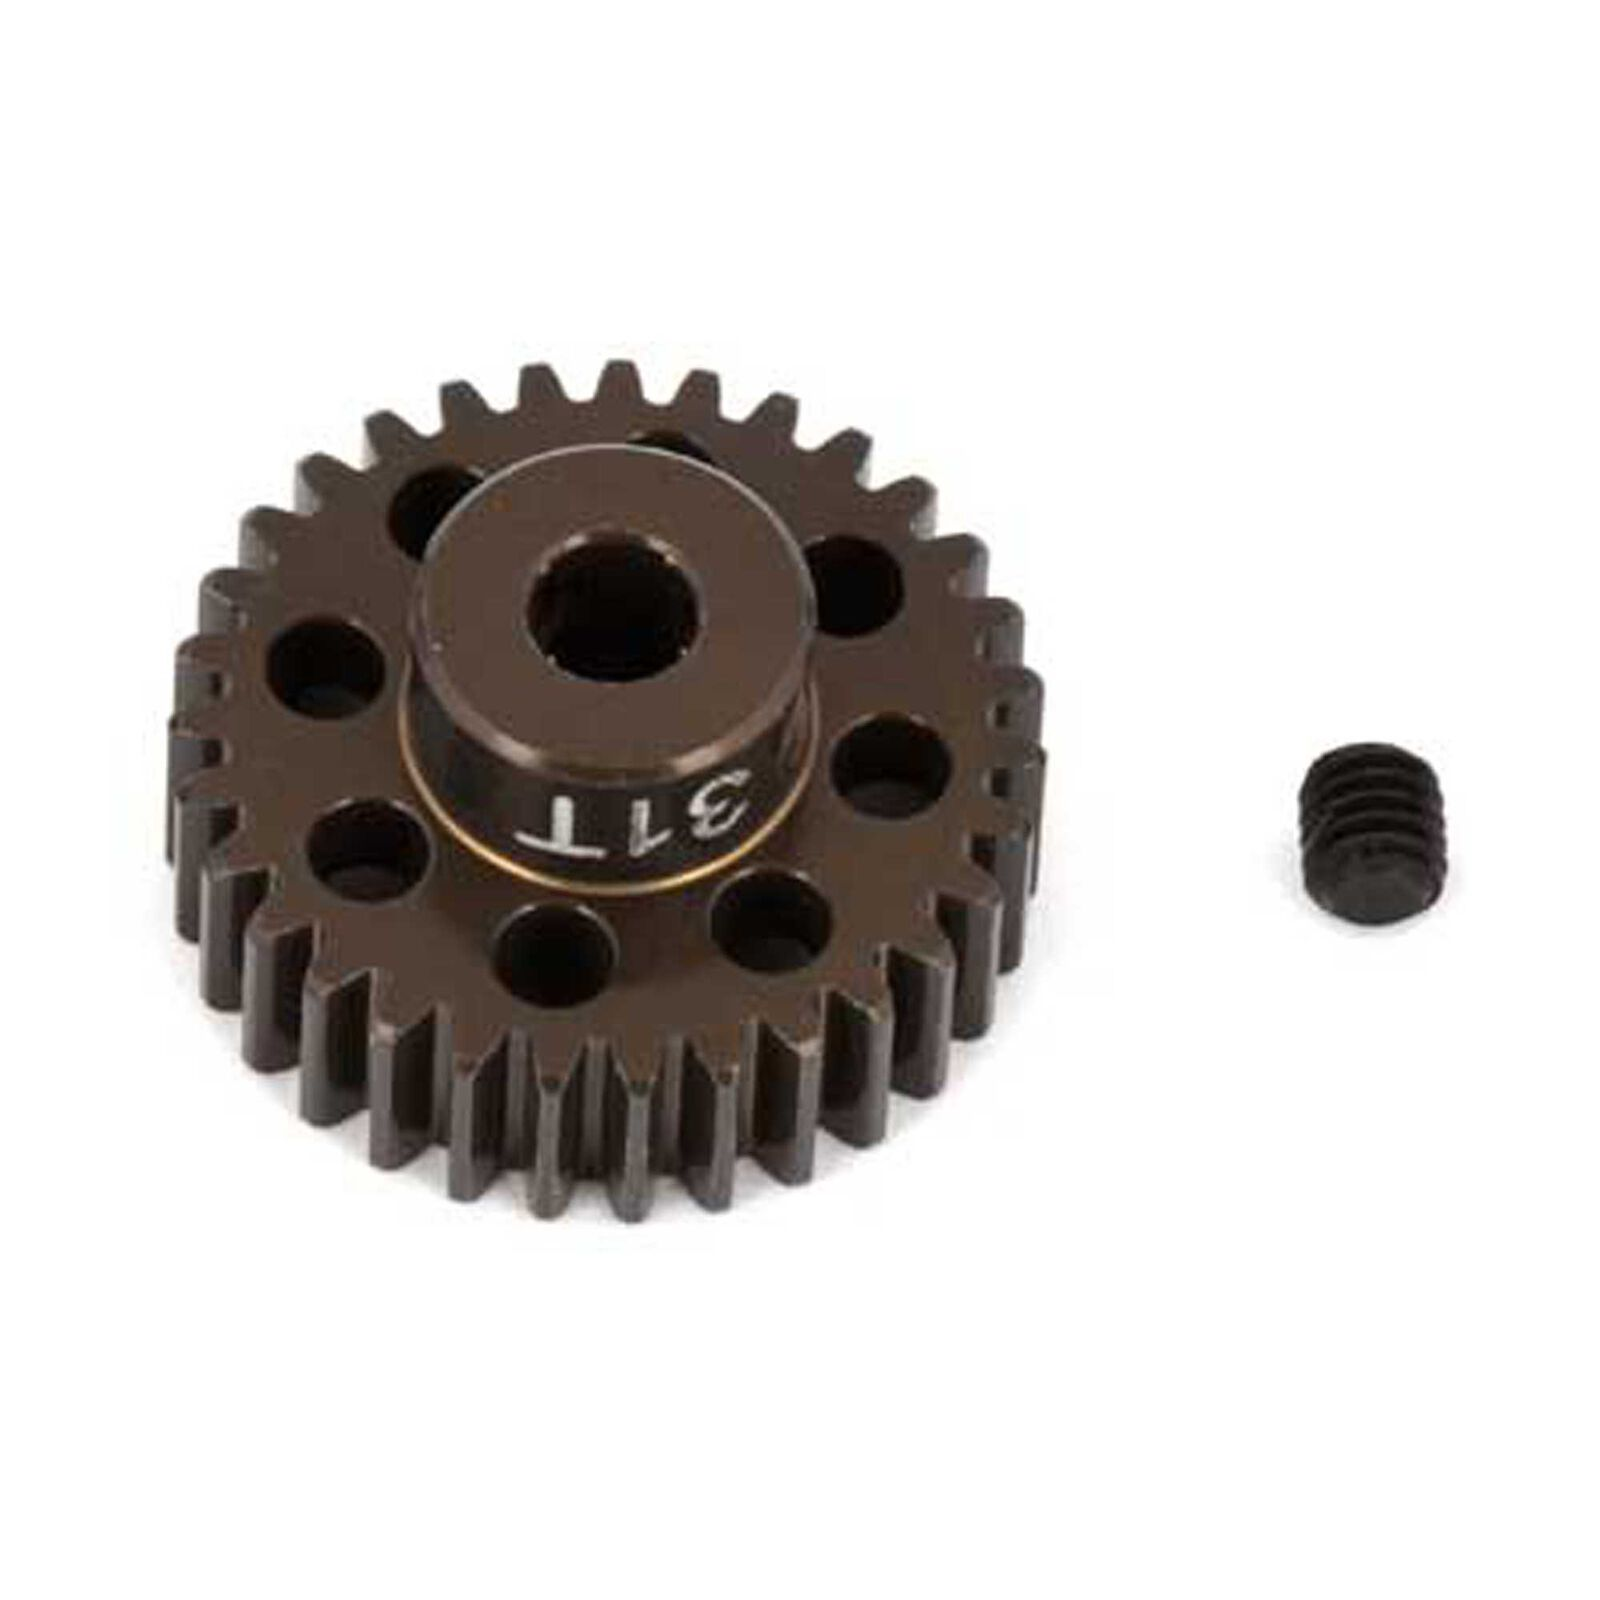 Factory Team Aluminum Pinion Gear, 31T, 48P, 1/8 shaft